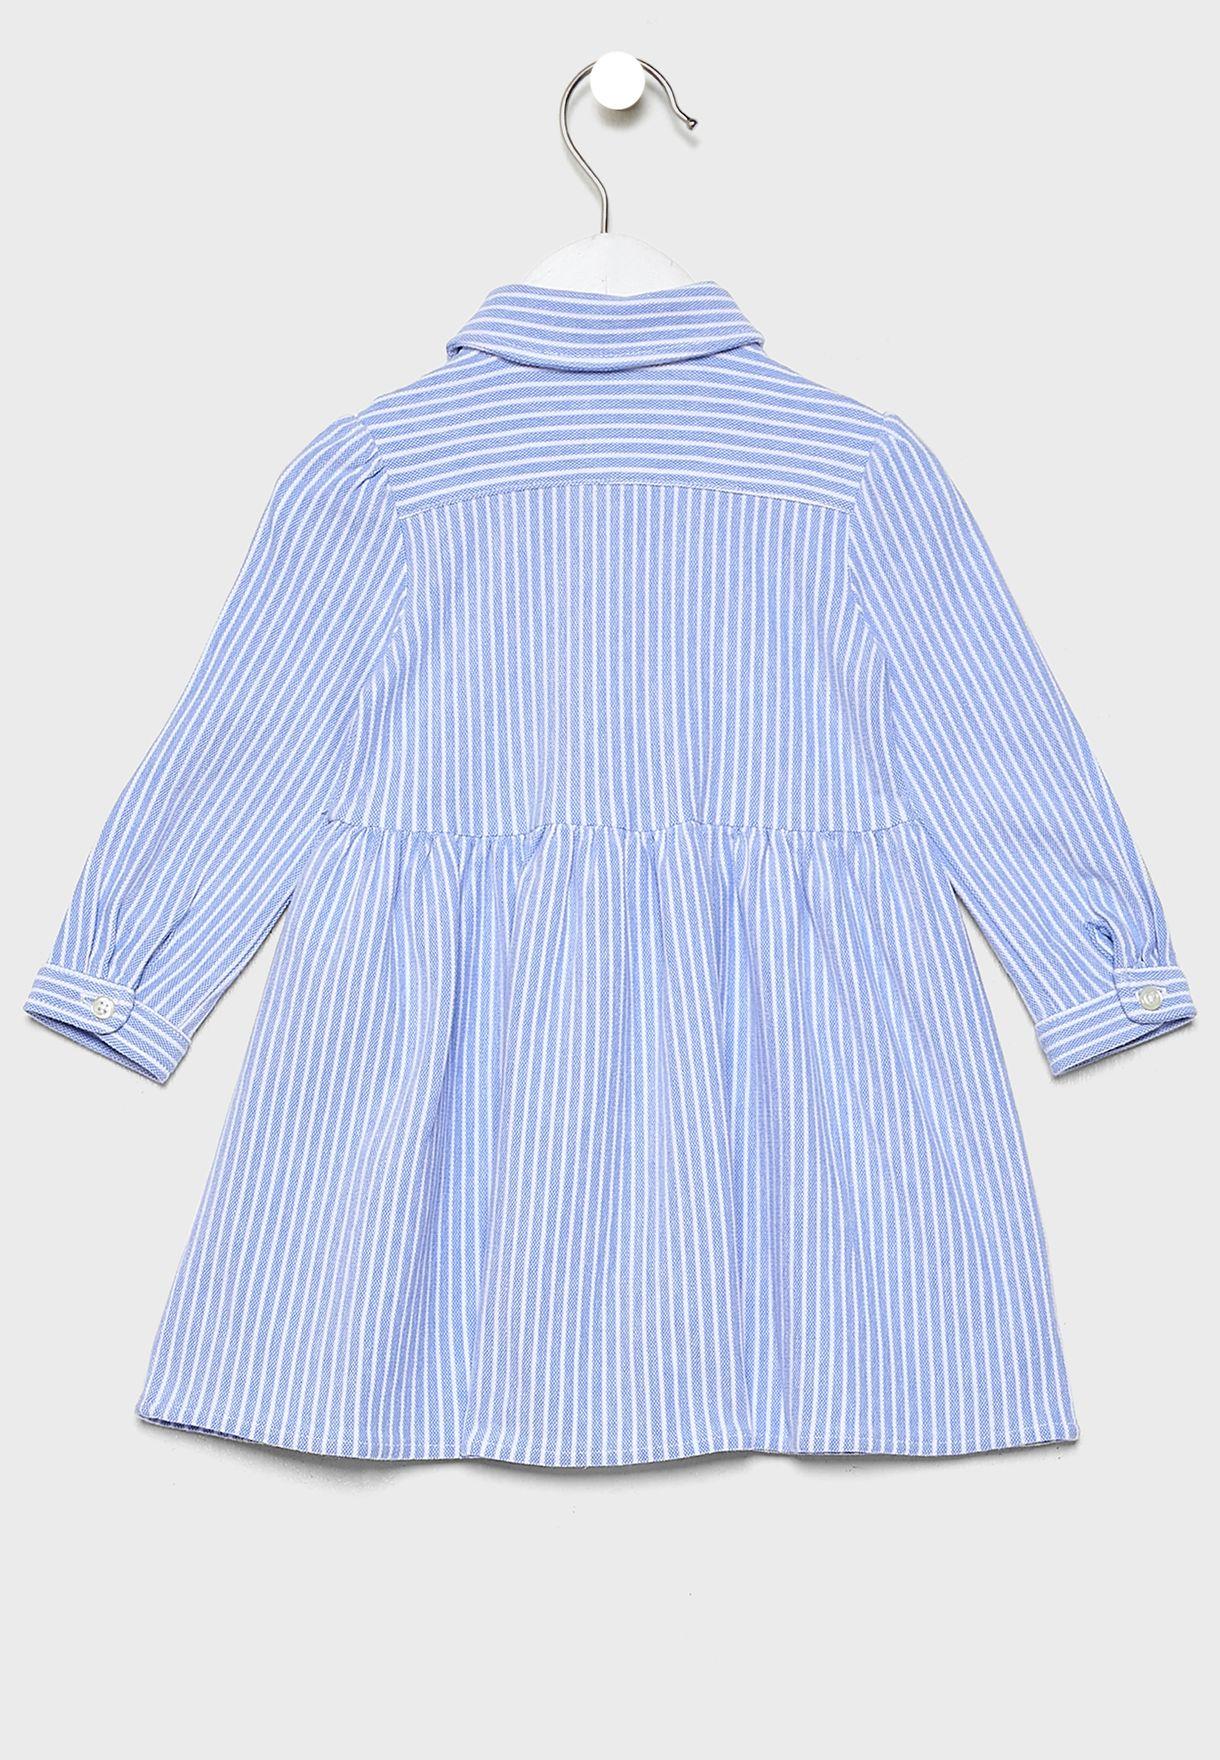 Infant Striped Dress + Shorts Set